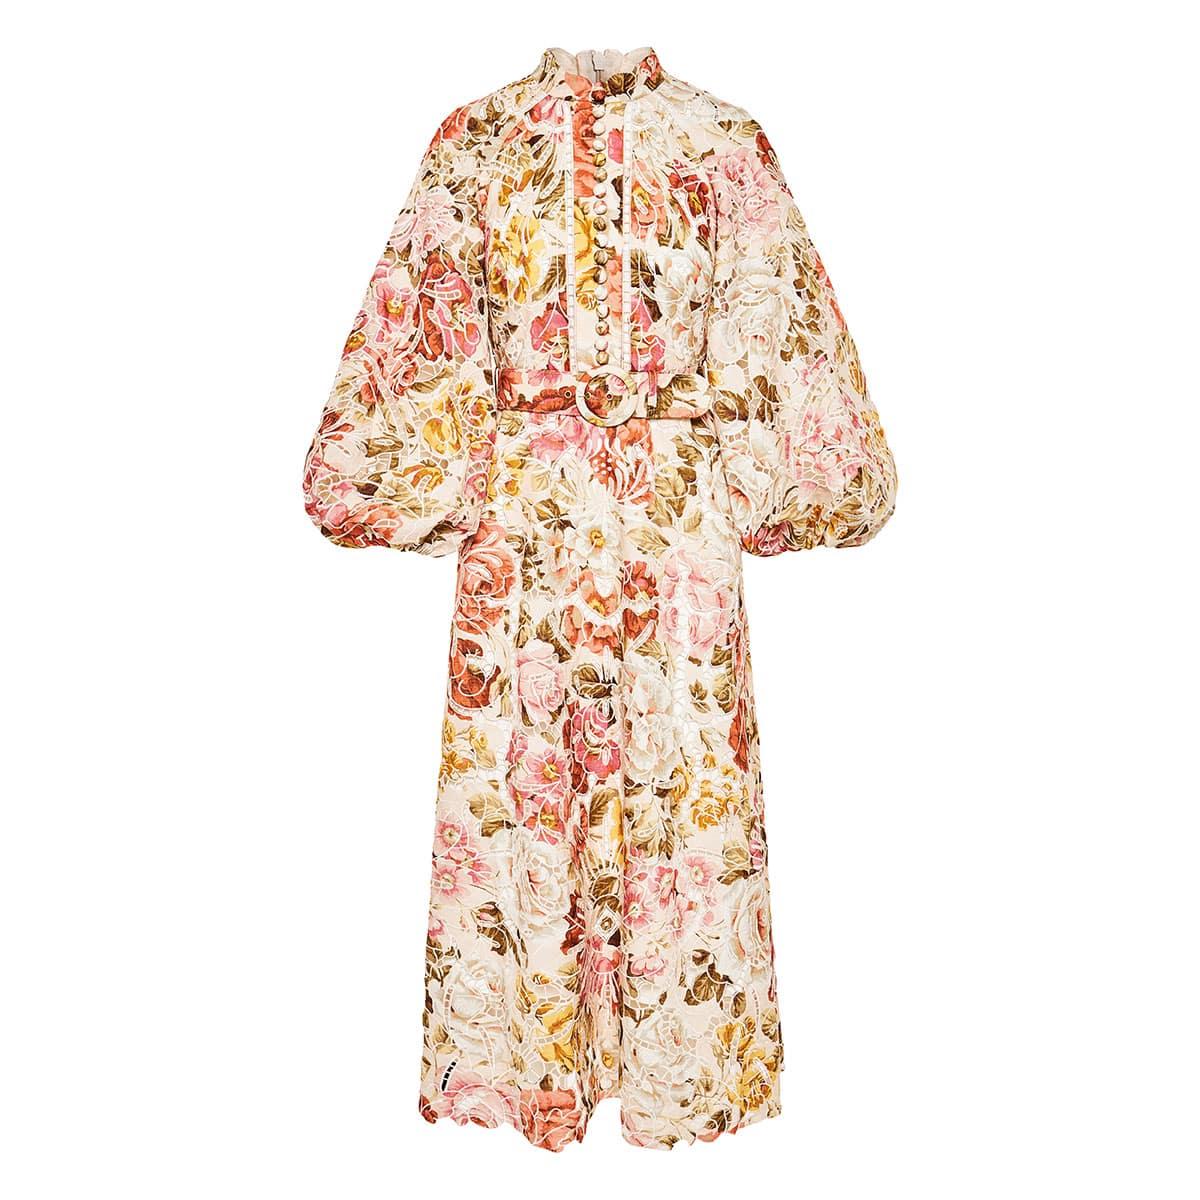 Bonita embroidered floral midi dress